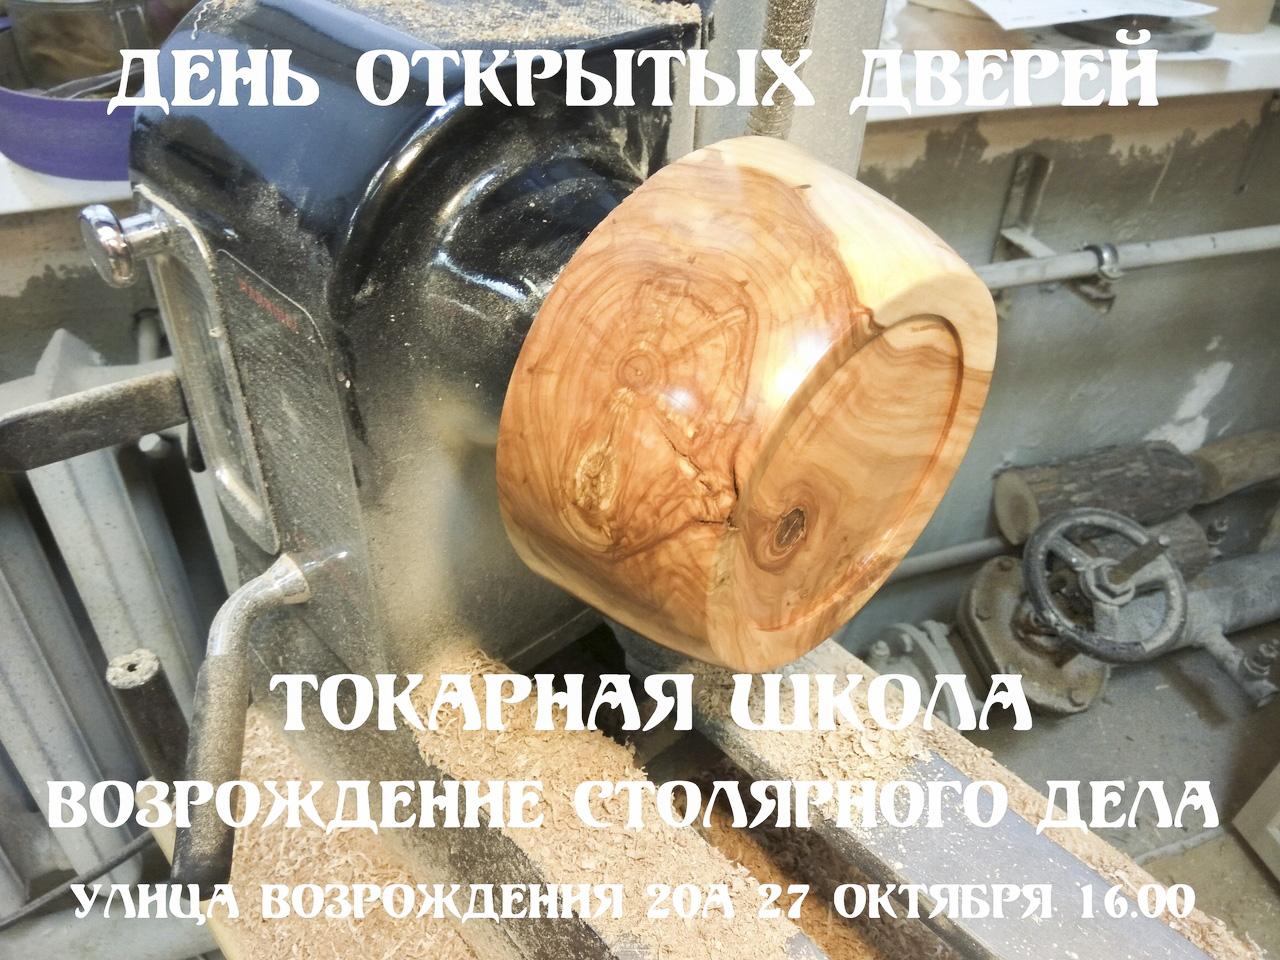 День открытых дверей токарной школы Rubankov (27-10-2018)